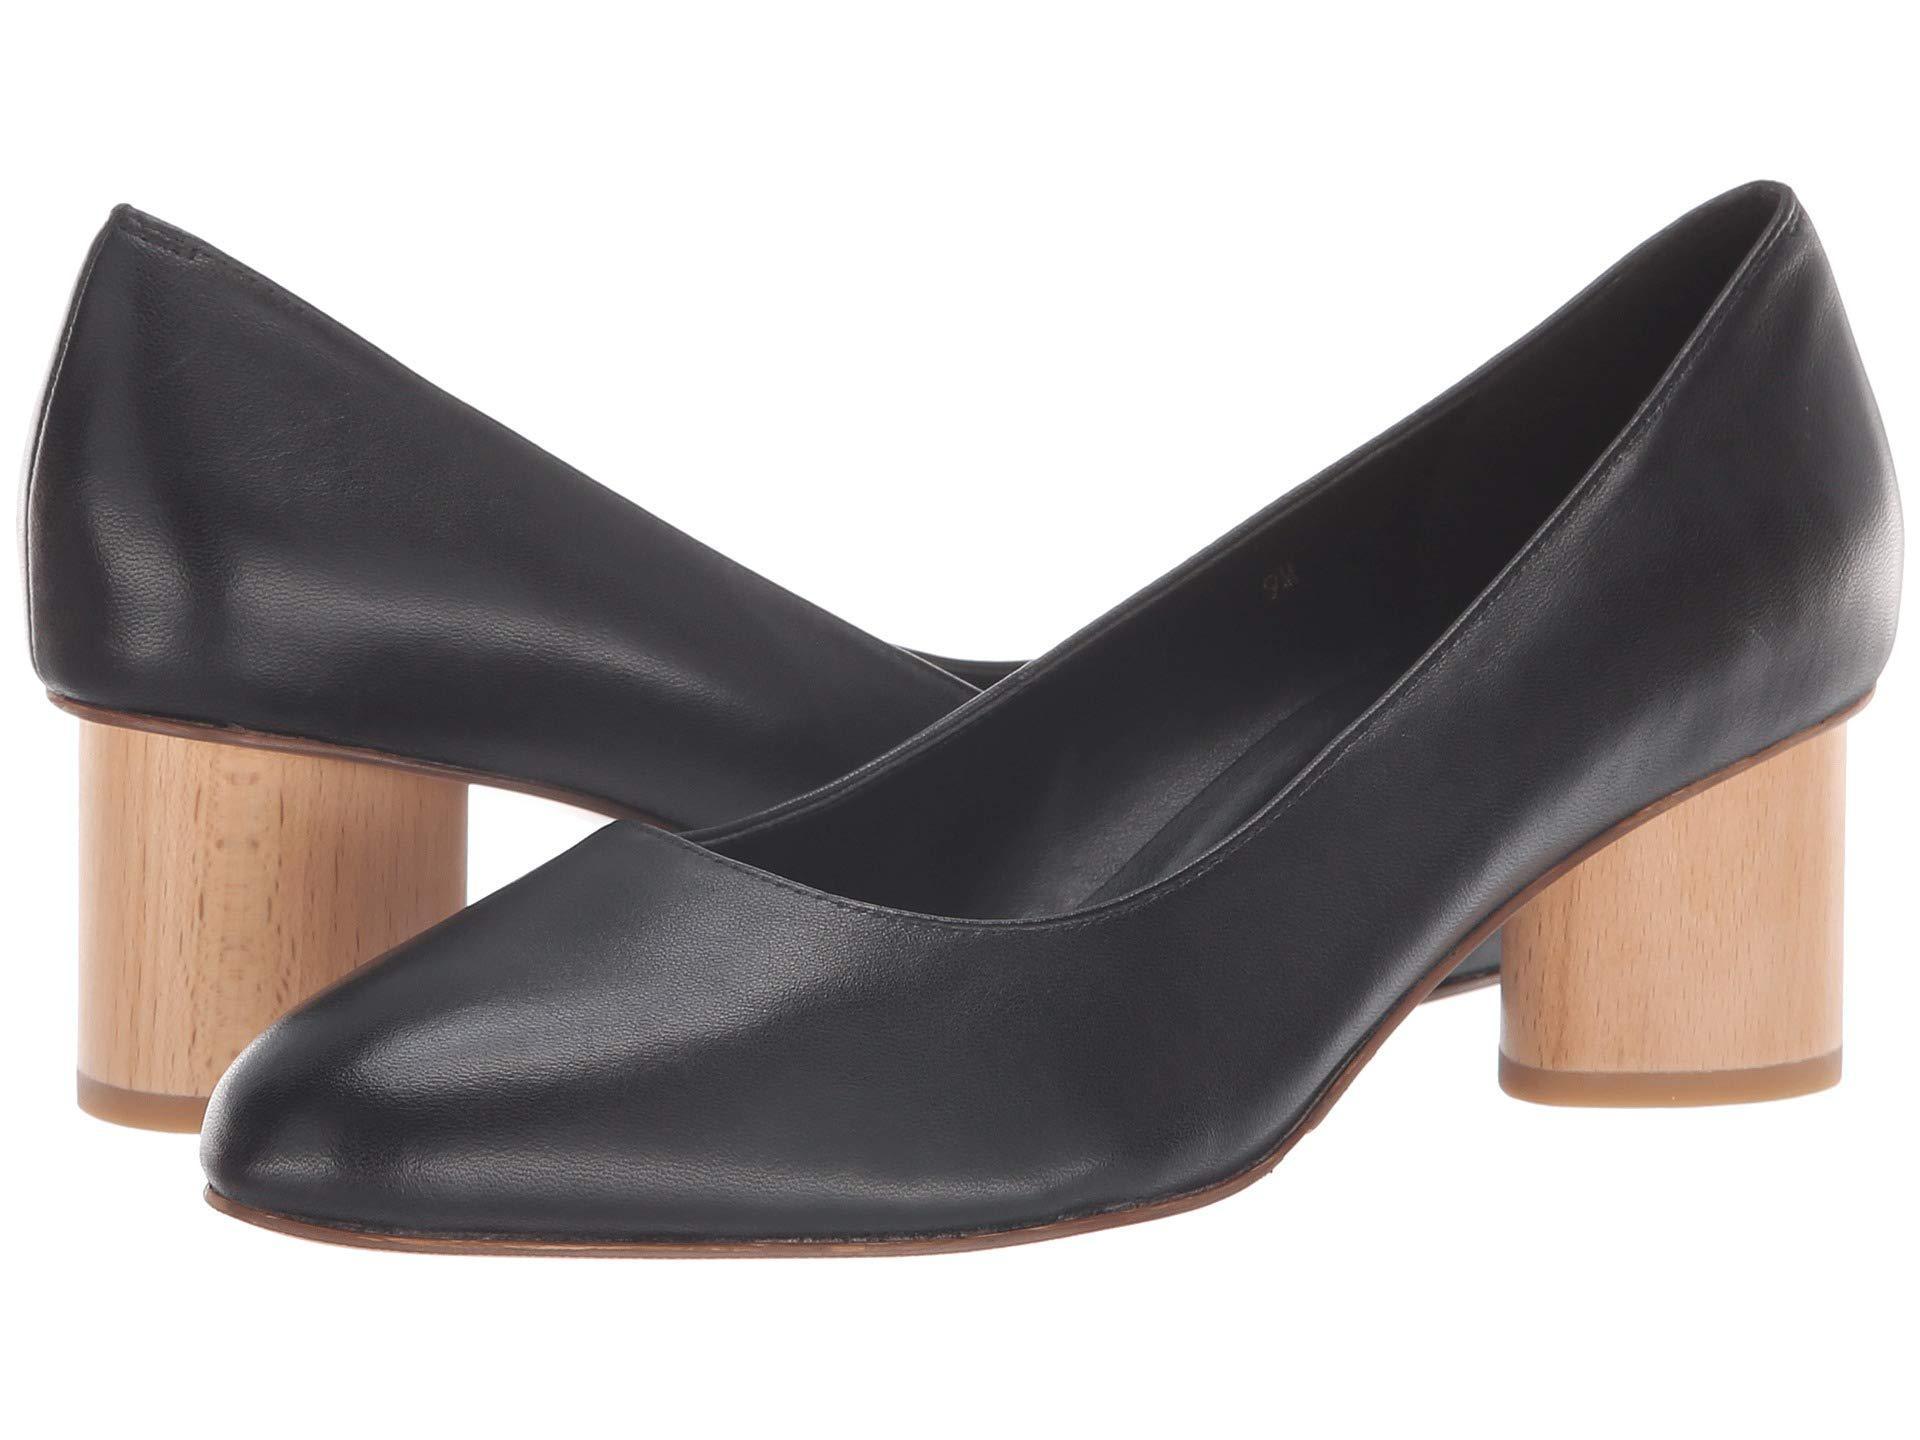 Lyst (navy Vaneli Poncia (navy Lyst Suede) Donna 1 2 Inch Heel scarpe in Nero 4741a3